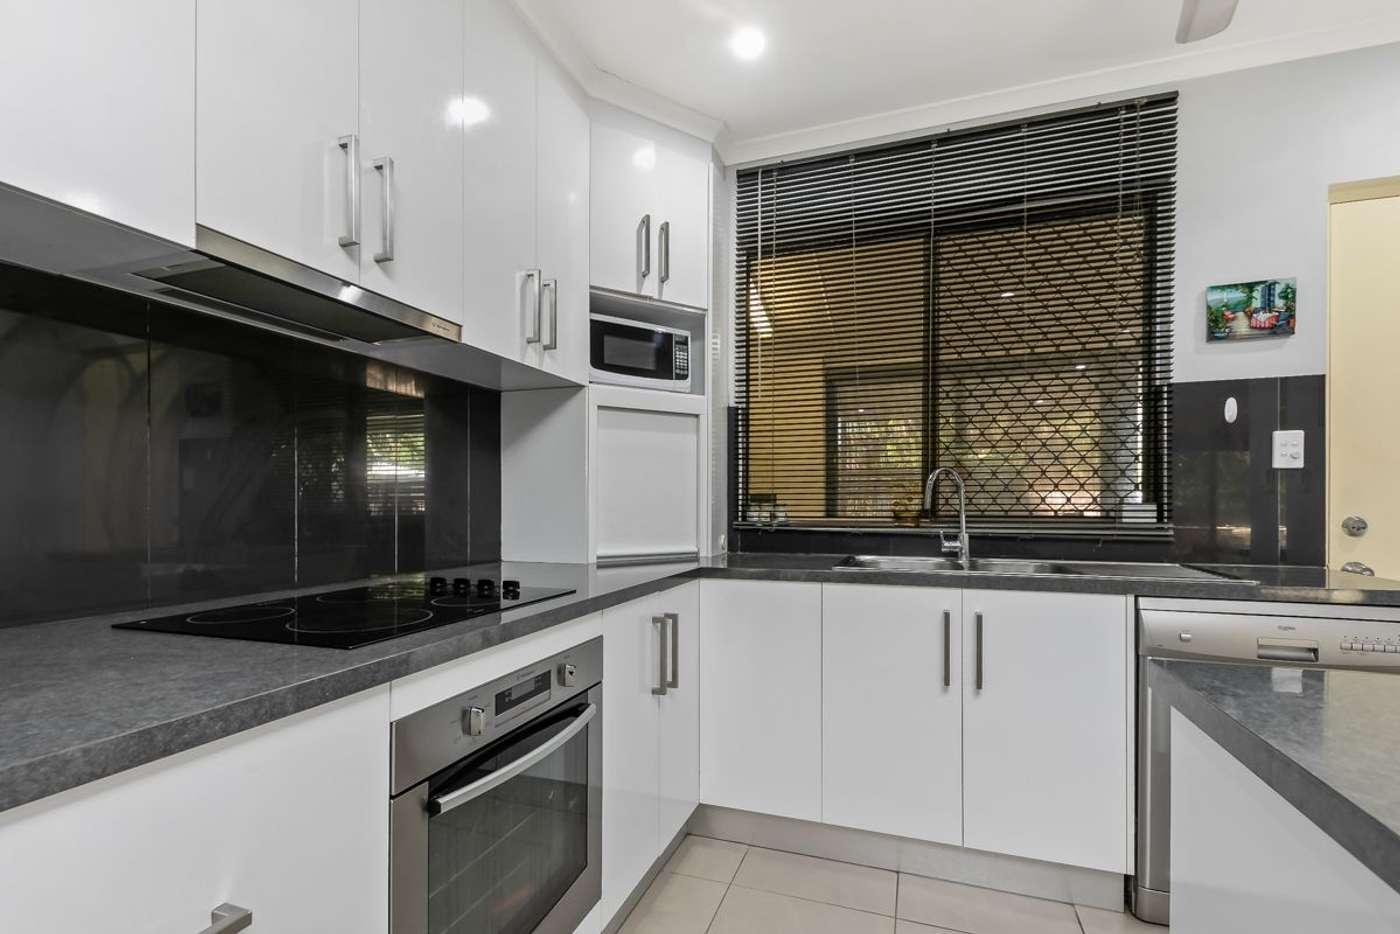 Main view of Homely unit listing, 1/3 Livistona Road, Karama NT 812